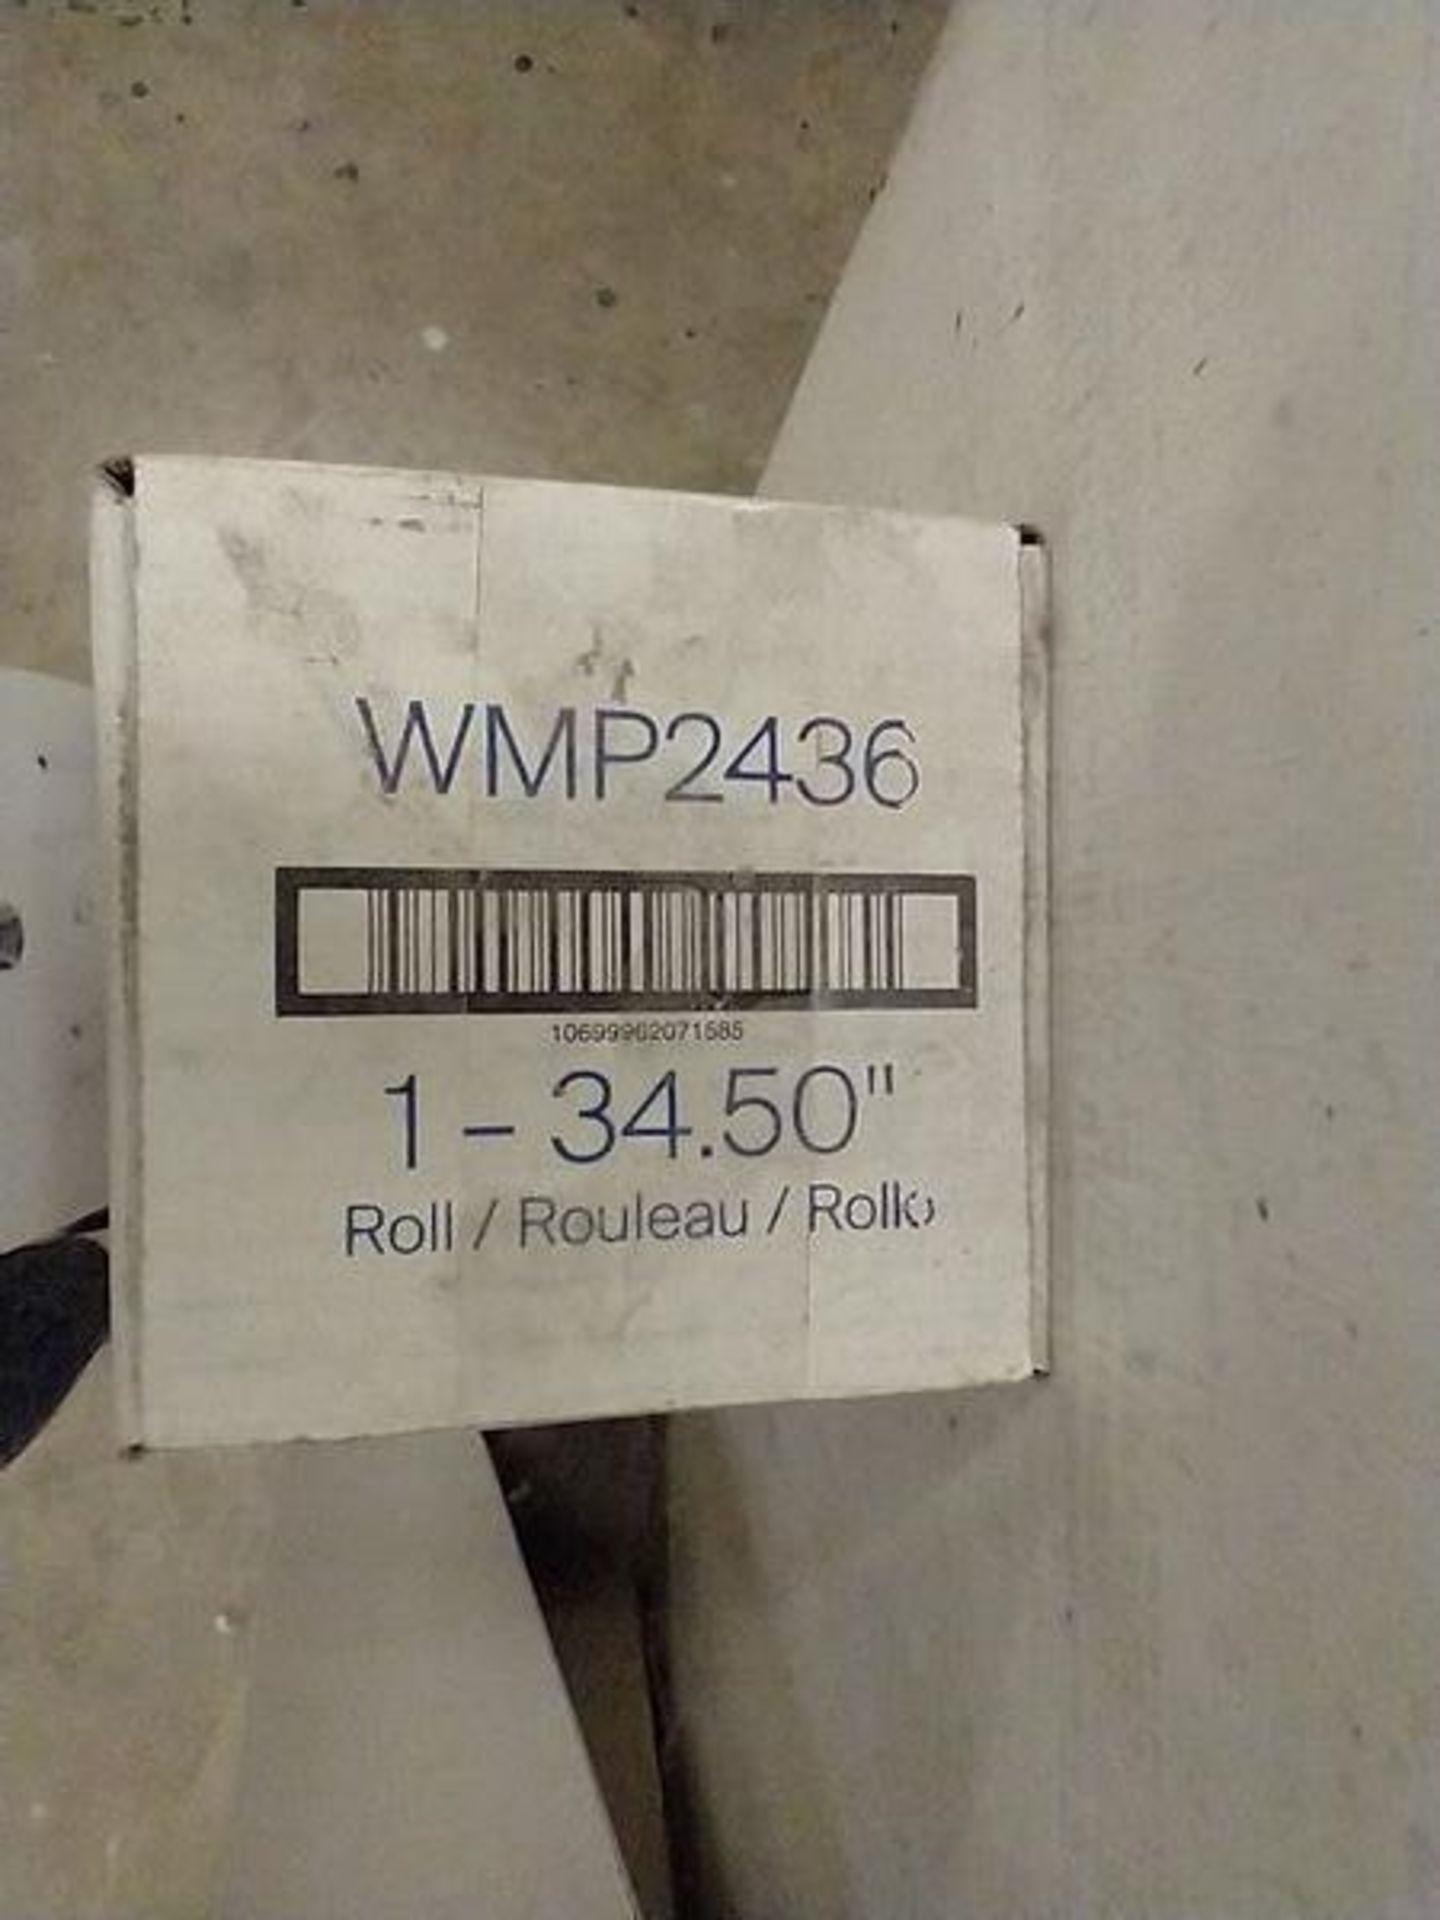 "ROLL OF PPG WHITE MASKING PAPER 36"" X 750' - MODEL WMP2436 - Image 2 of 2"